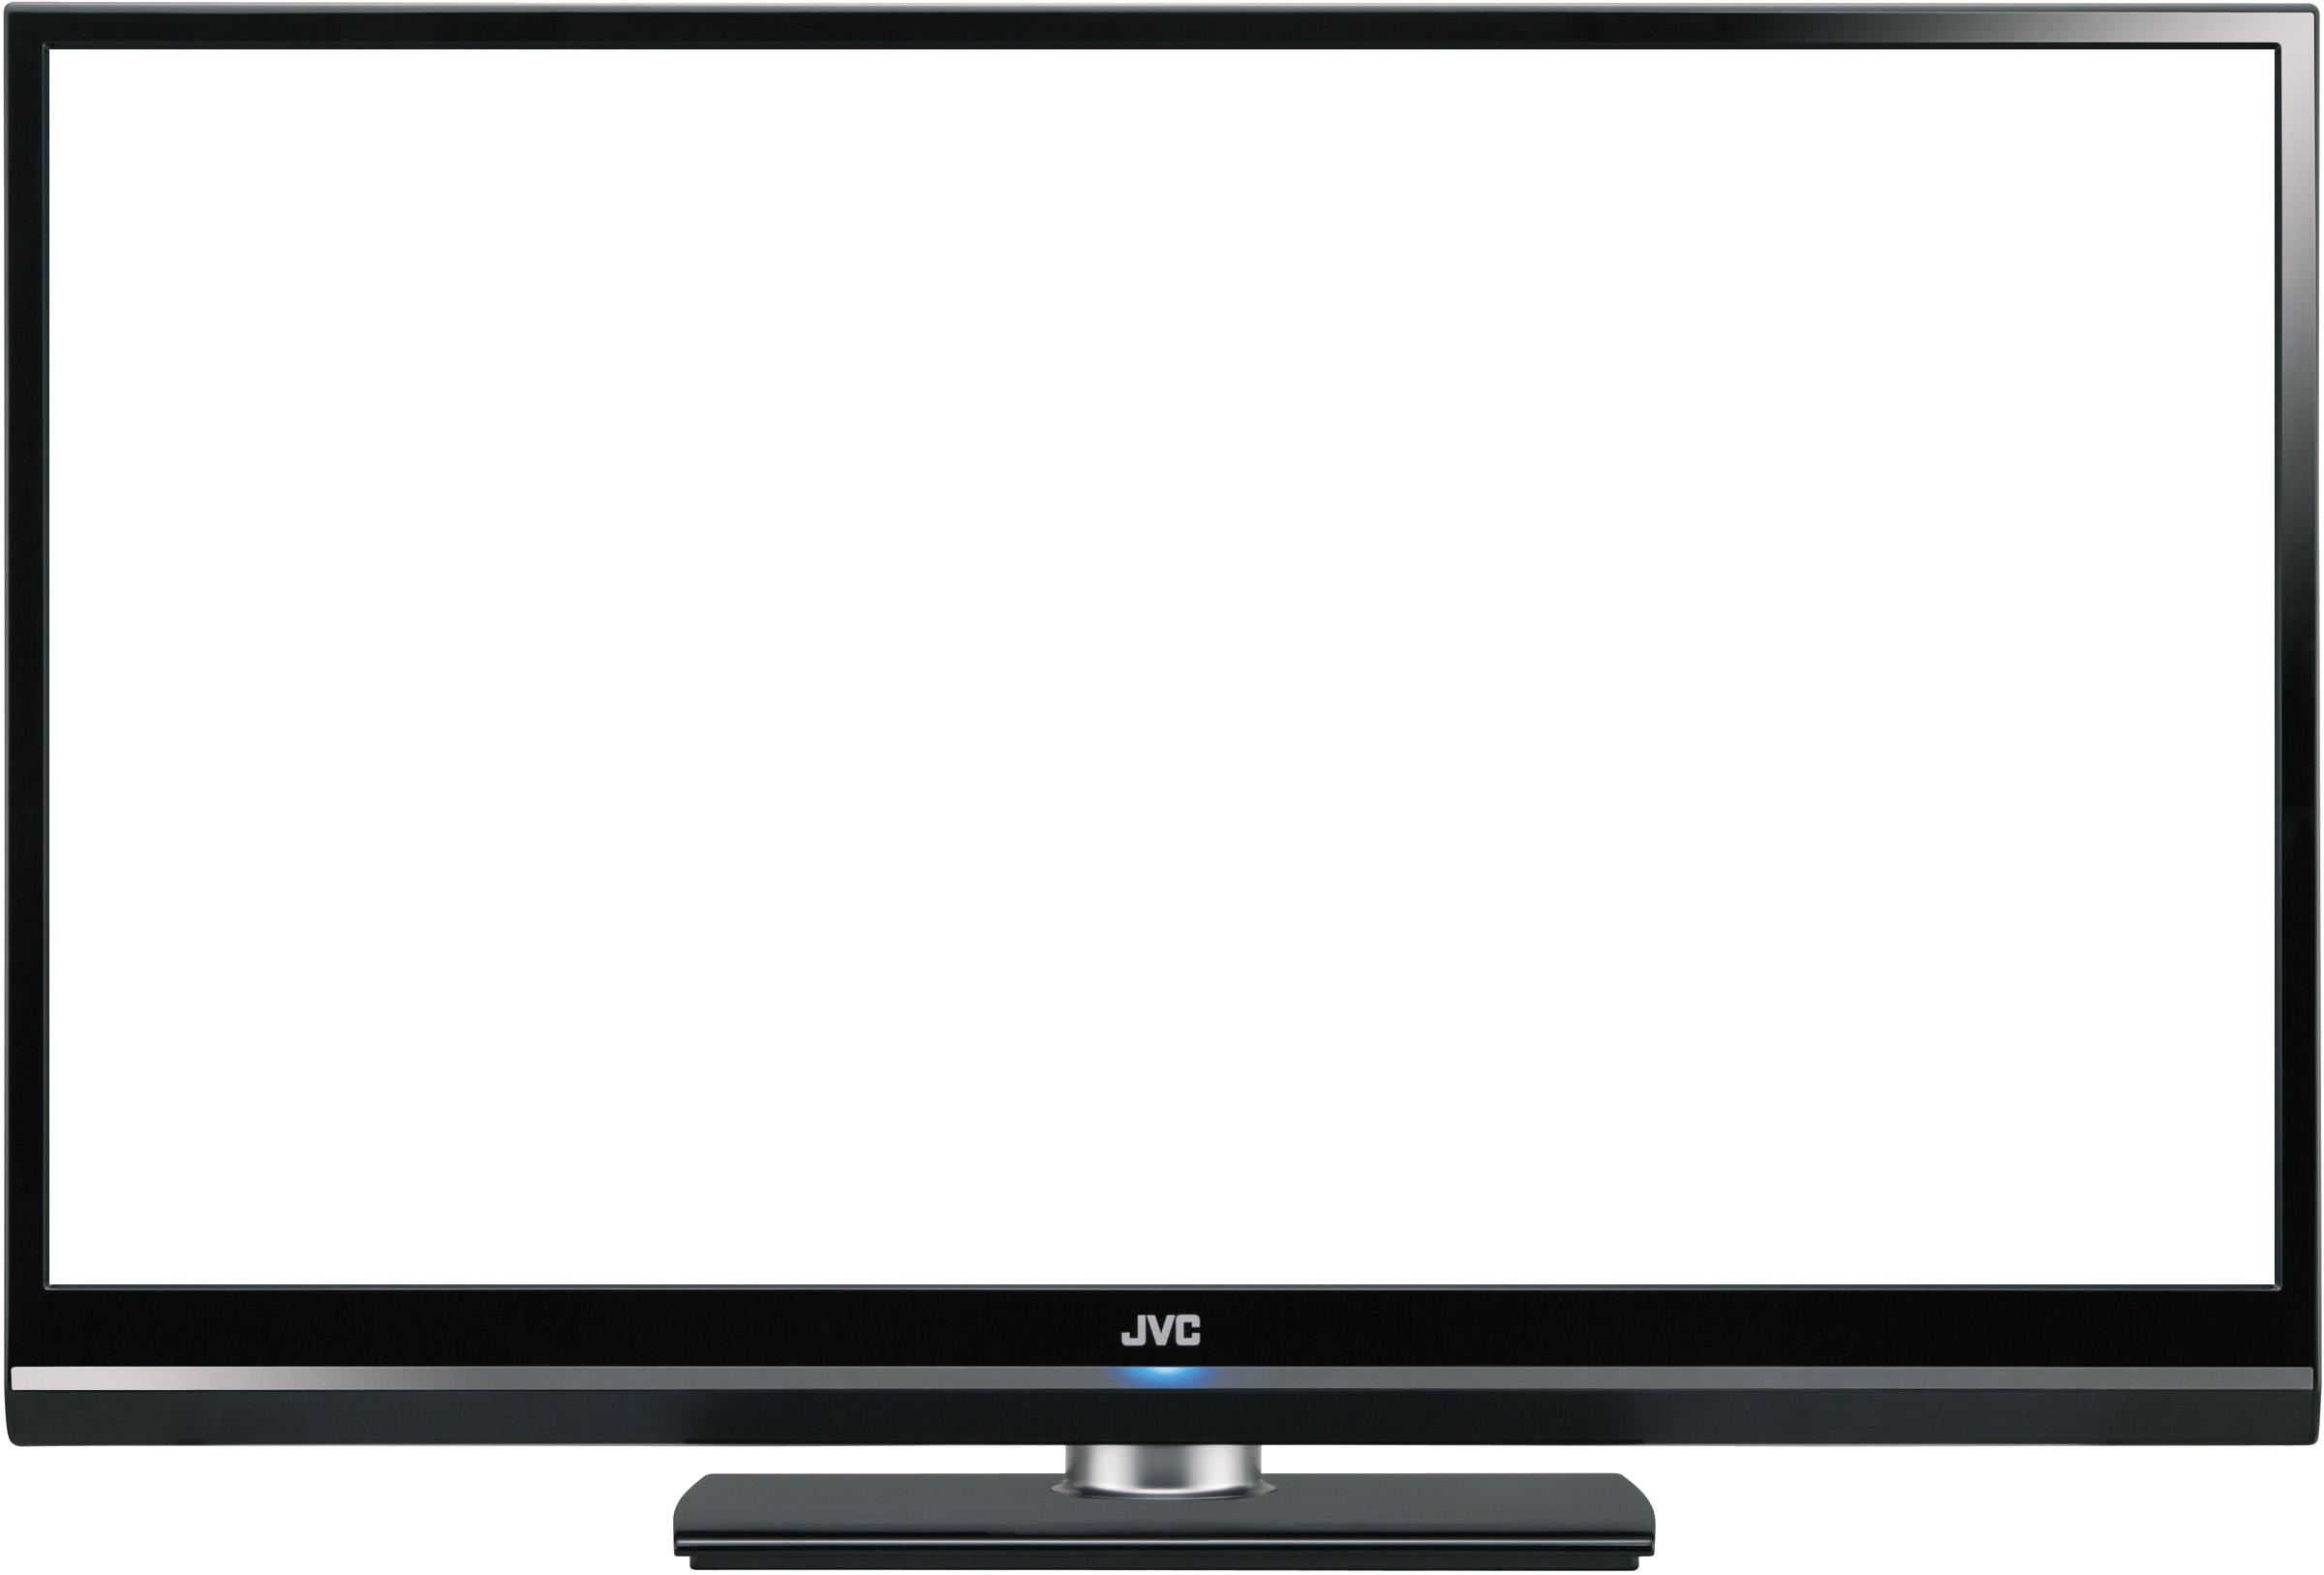 Jvc Monitor Png Image Lcd Television Television Lcd